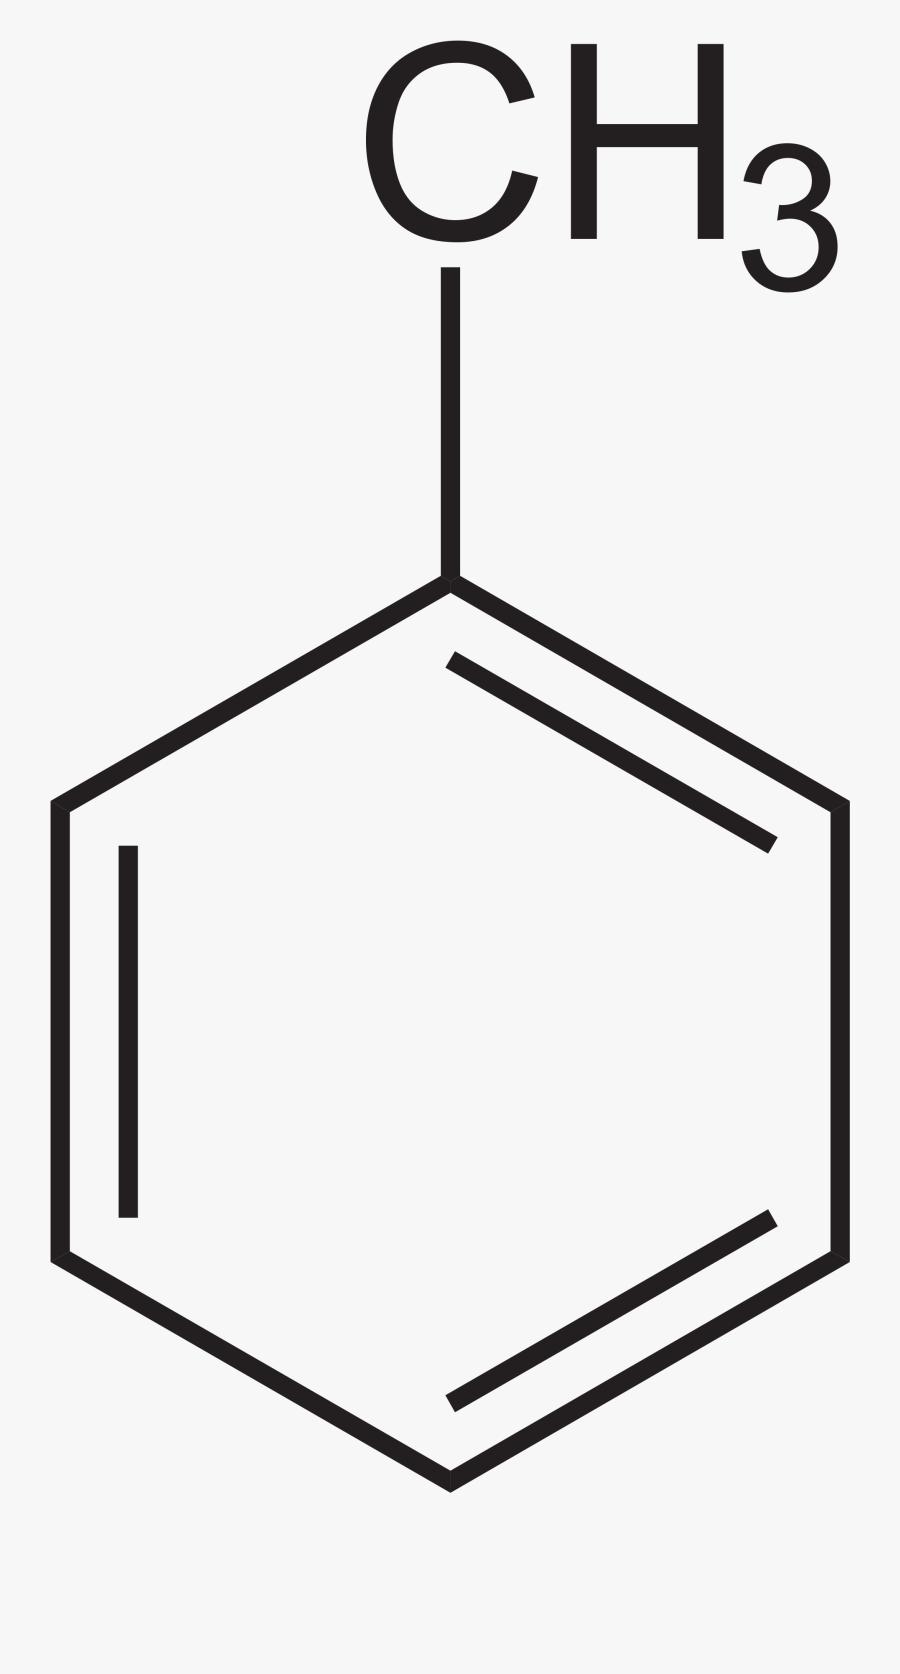 File - Toluol - Svg - Formule Semi Développée Toluène - 2 Amino 3 Methyl 1 Butanol, Transparent Clipart